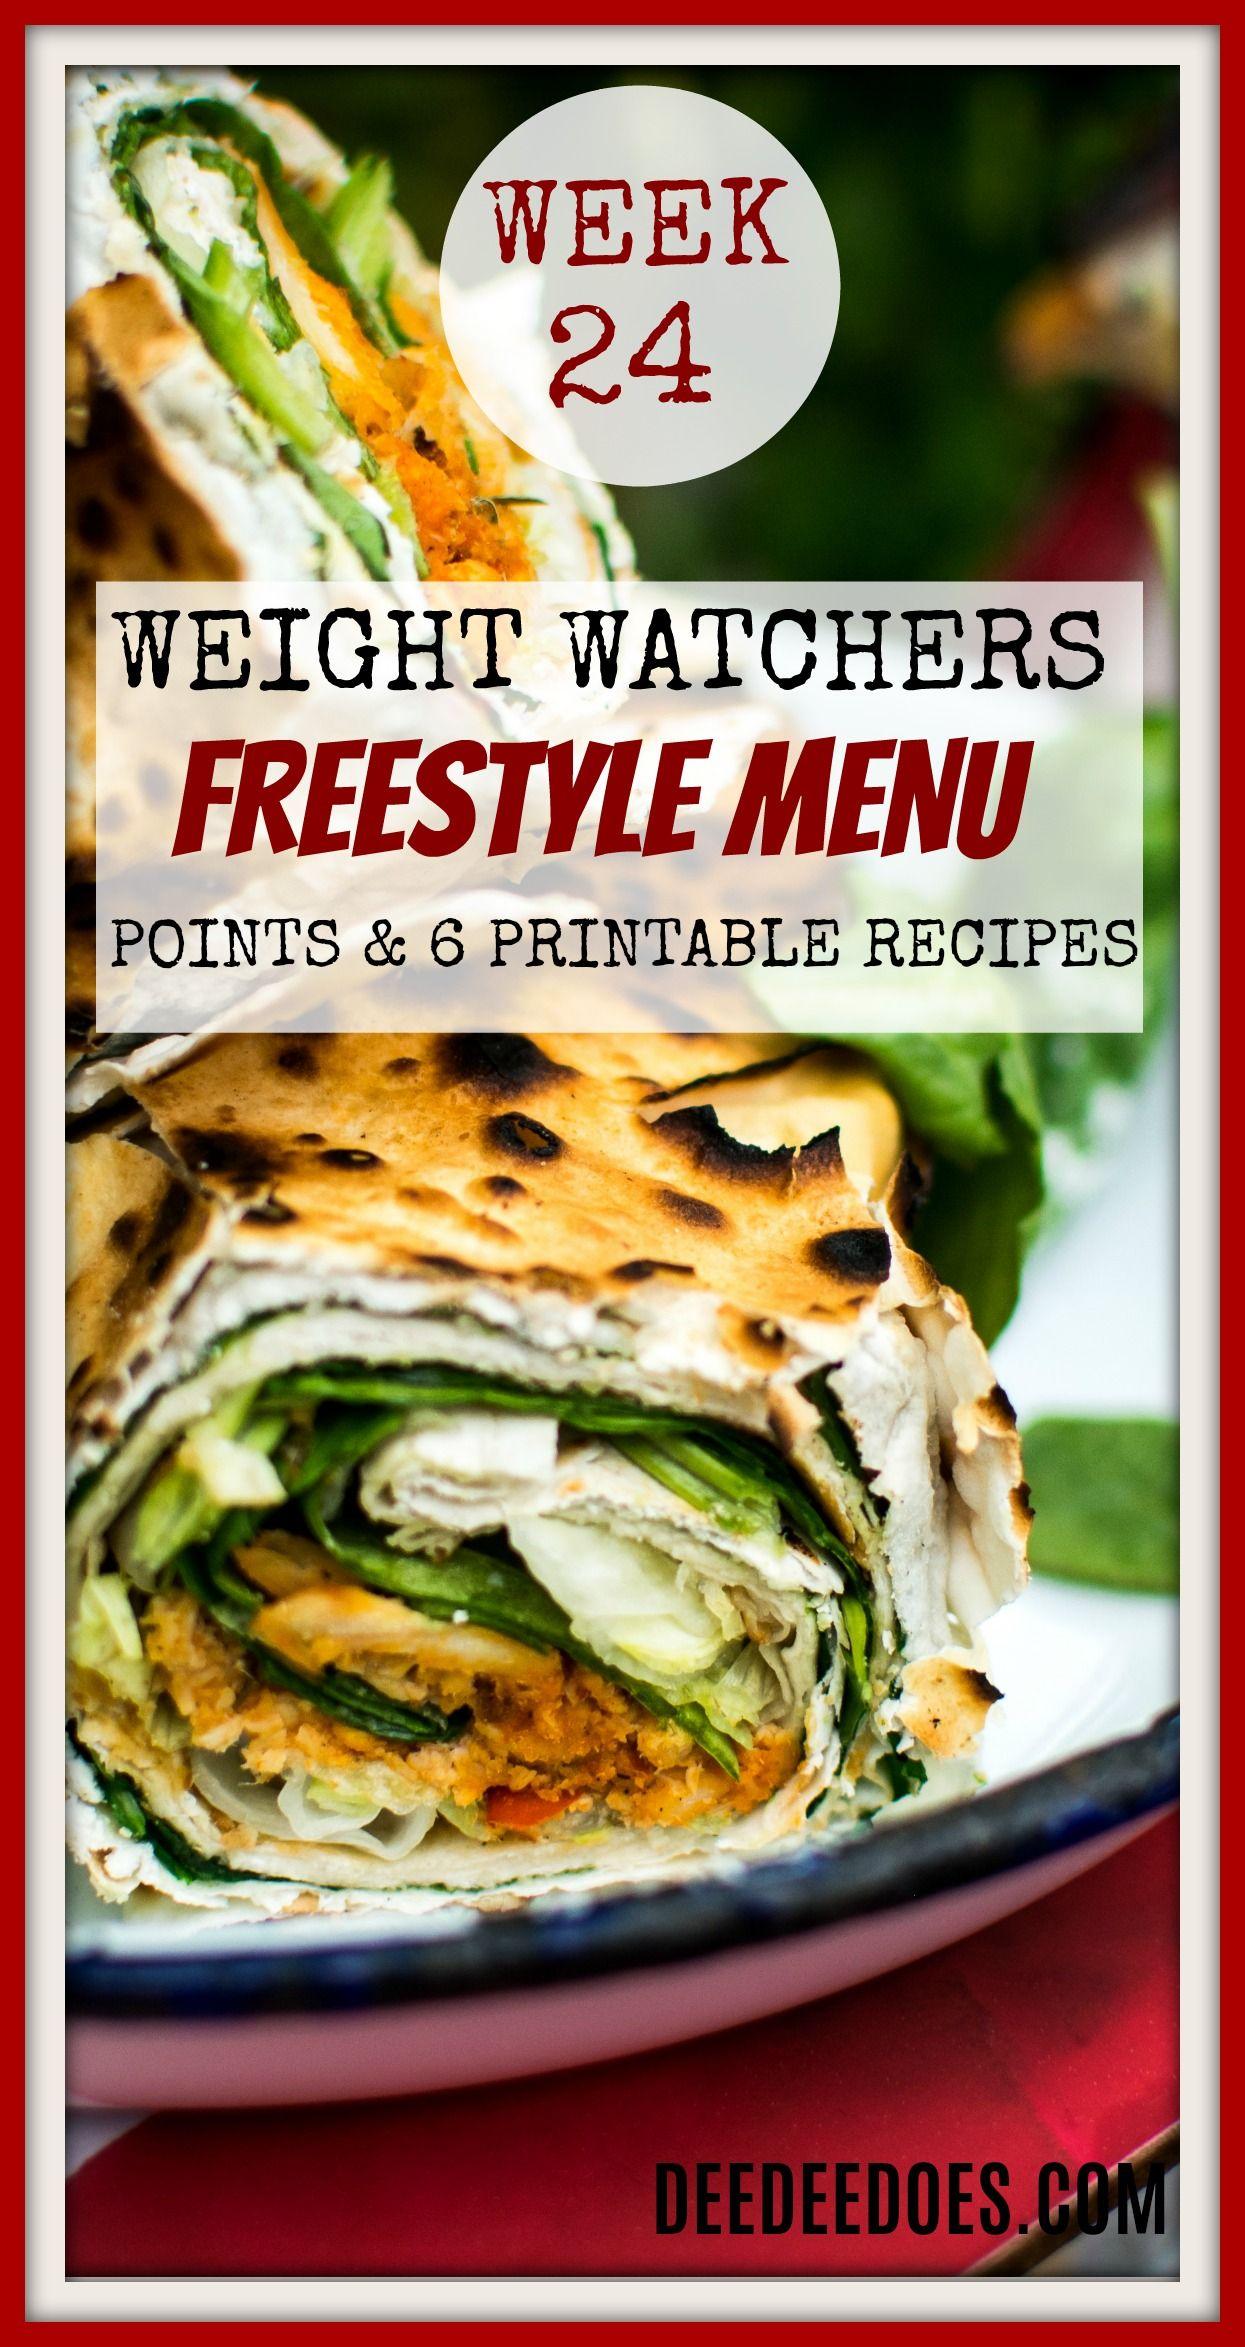 Weekly menu plan #29 recipe girl | weight watcher freestyle meal.